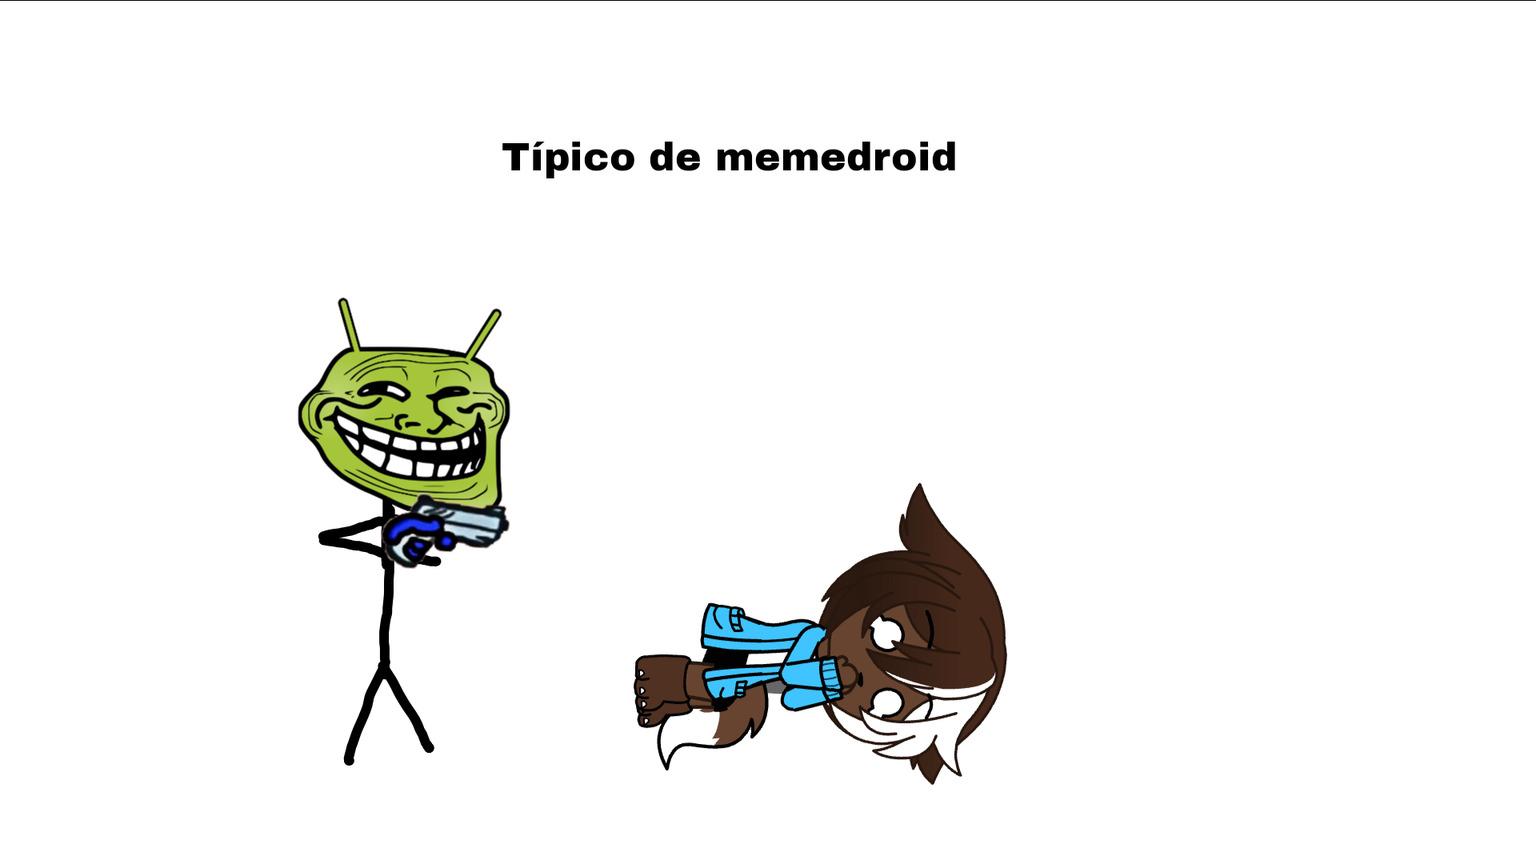 Tipico - meme